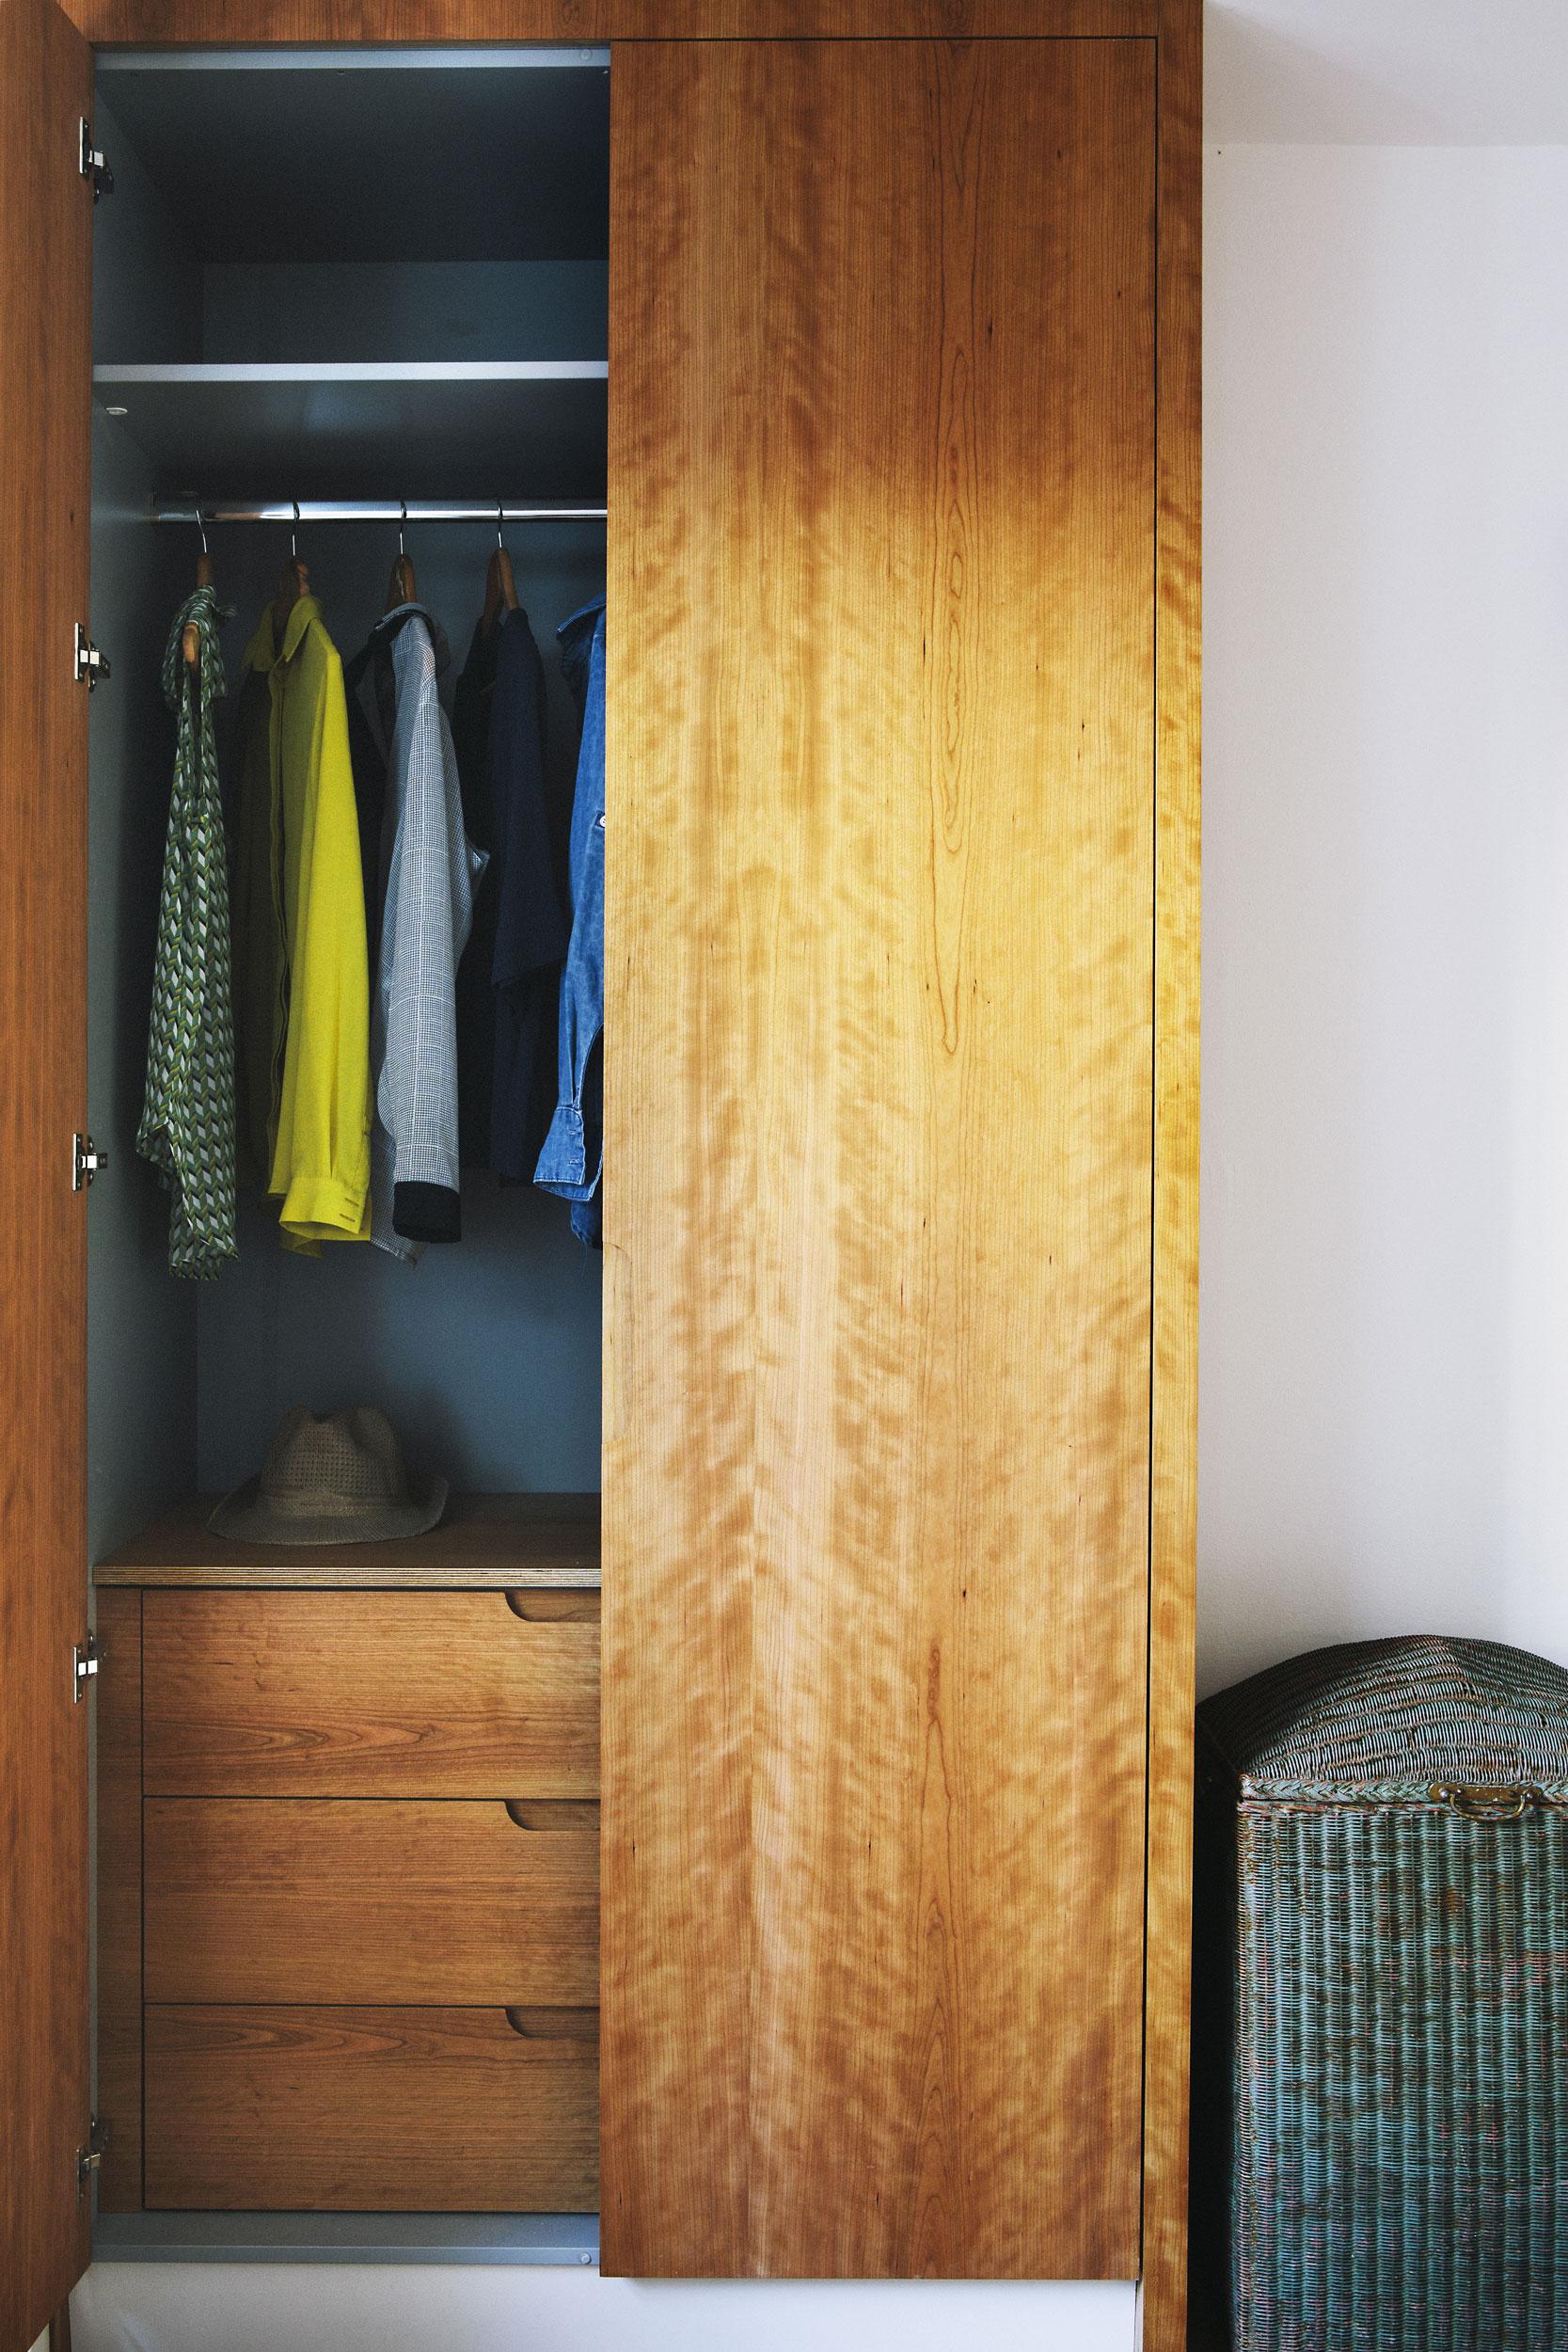 bespoke wardrobe design drawers carpenter gypsy hill